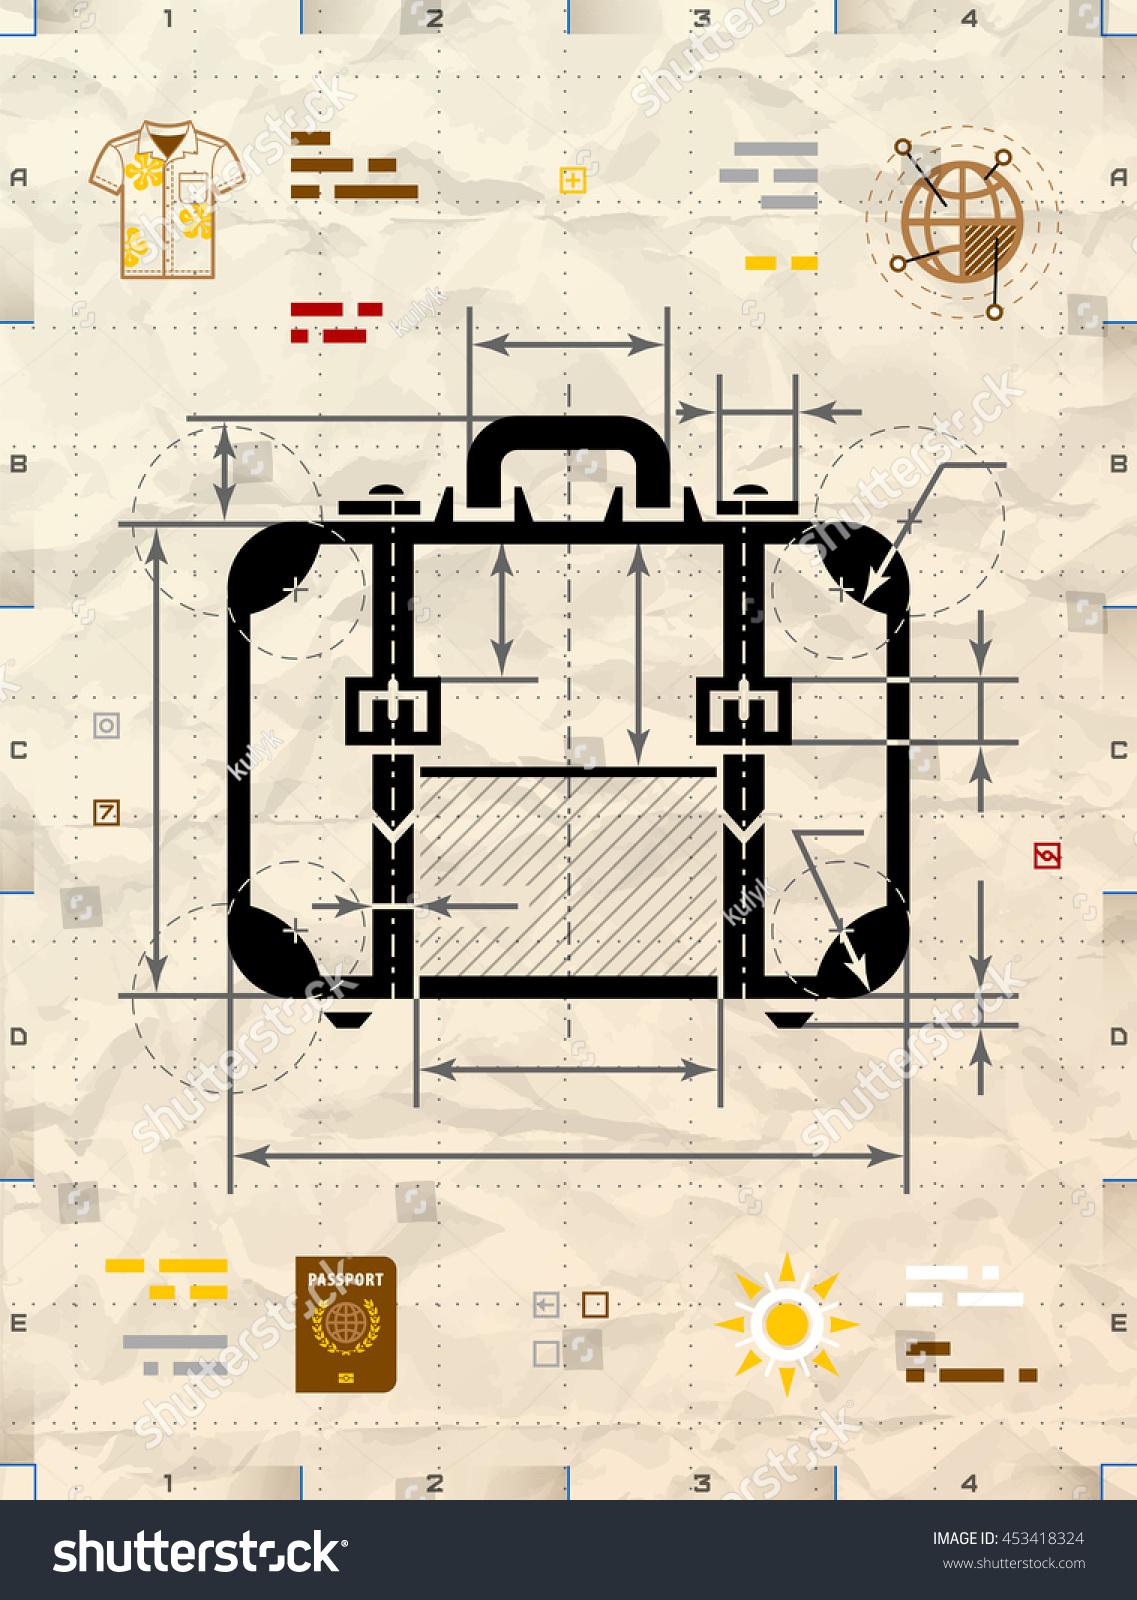 Suitcase silhouette technical blueprint drawing drafting stock suitcase silhouette as technical blueprint drawing drafting of travel bag on crumpled kraft paper malvernweather Choice Image